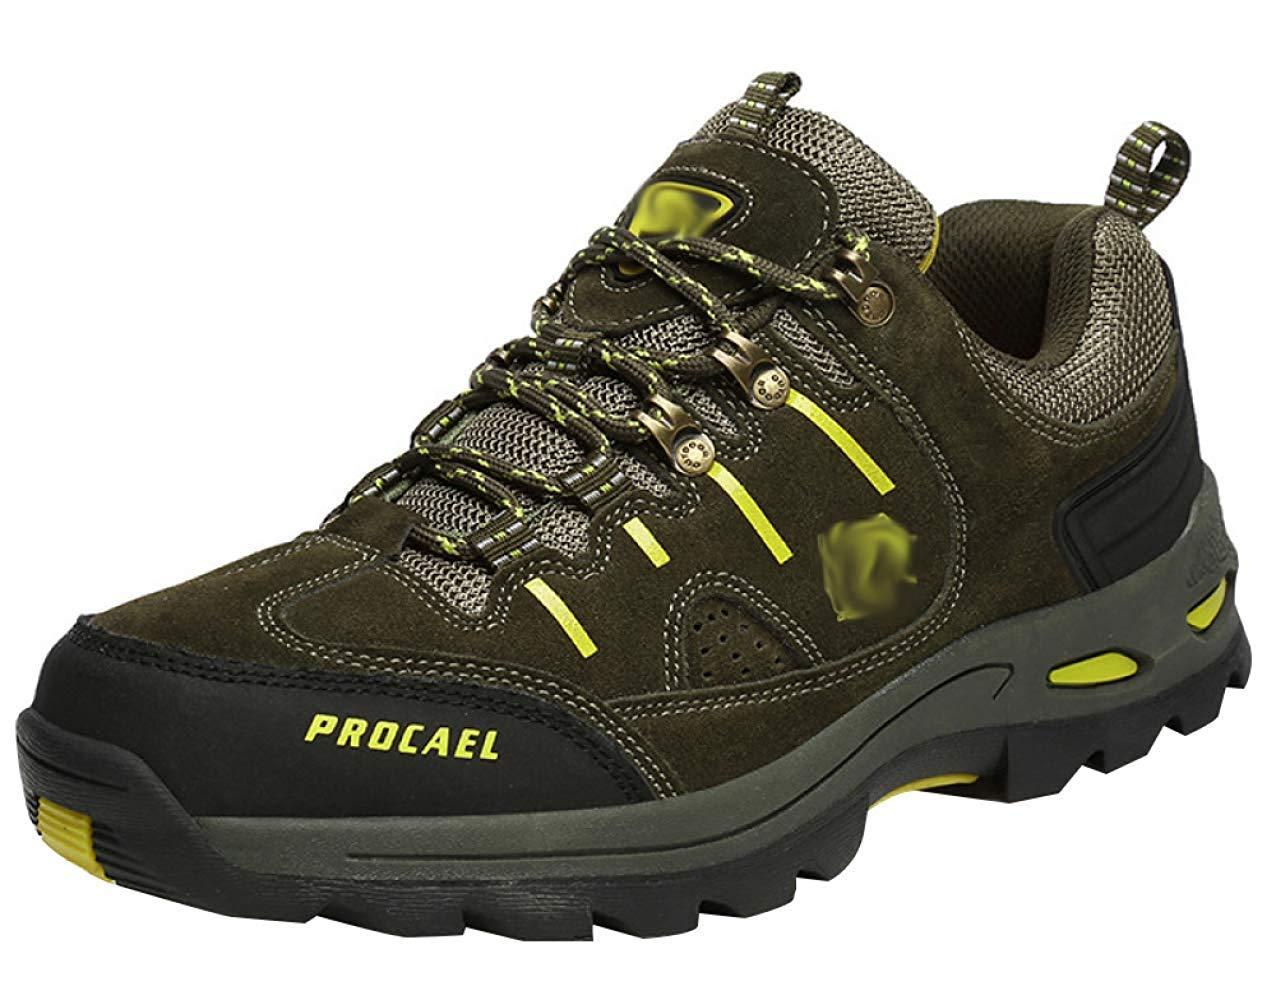 HhGold Männer Wanderschuhe Stiefel Leder Wanderschuhe Turnschuhe Für Outdoor Trekking Training Beiläufige Arbeit (Farbe : 22, Größe : 44EU)